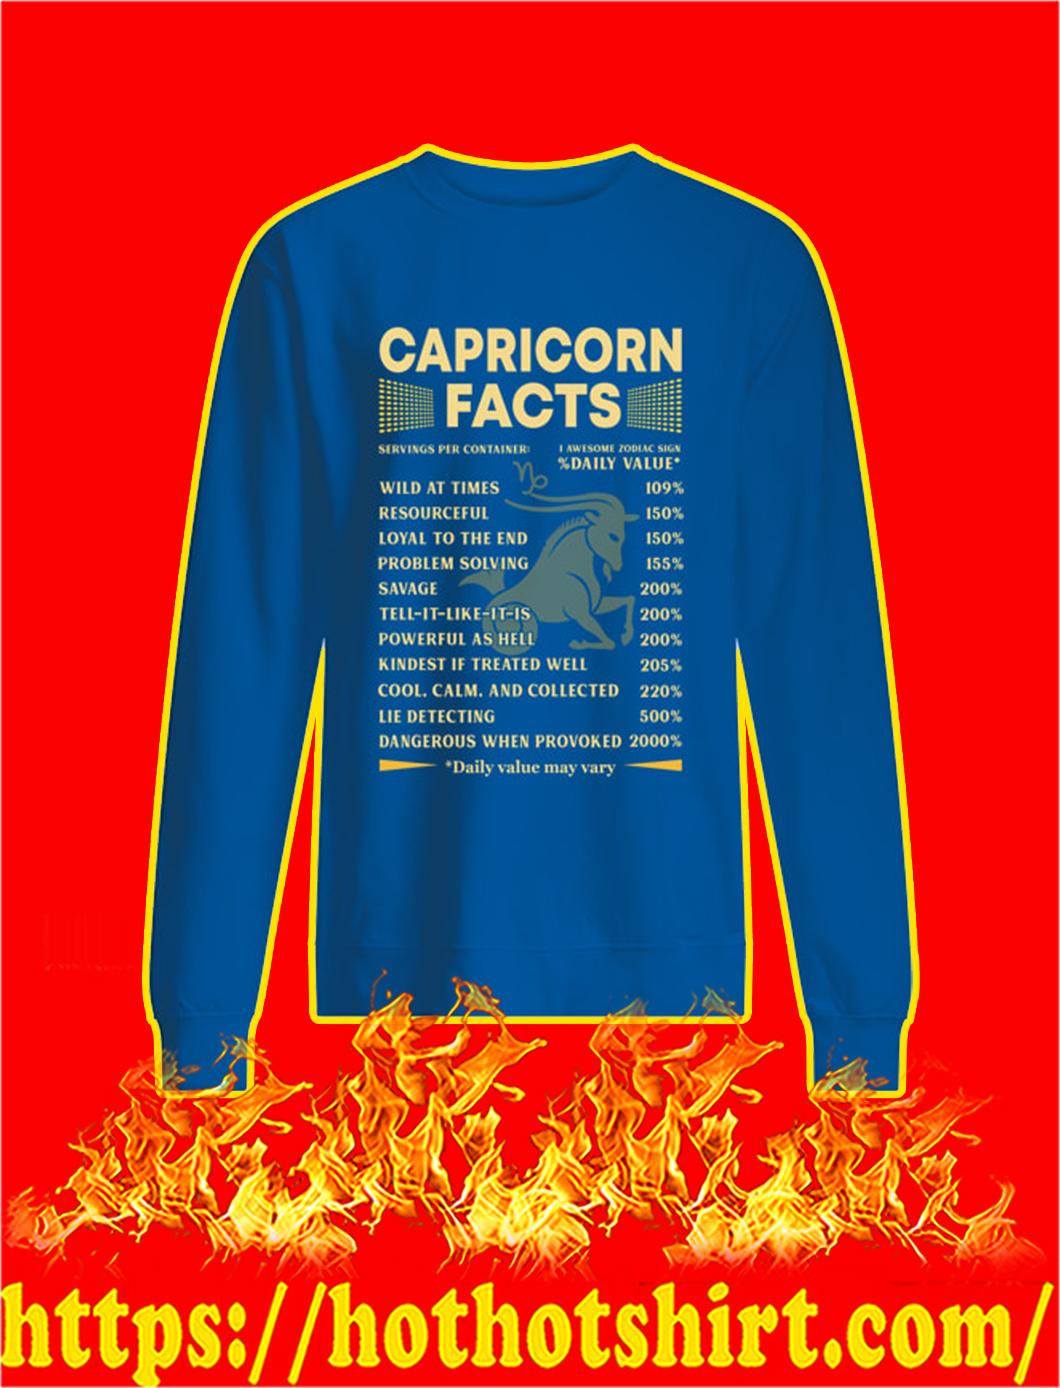 Capricorn Facts Servings Per Container sweatshirt